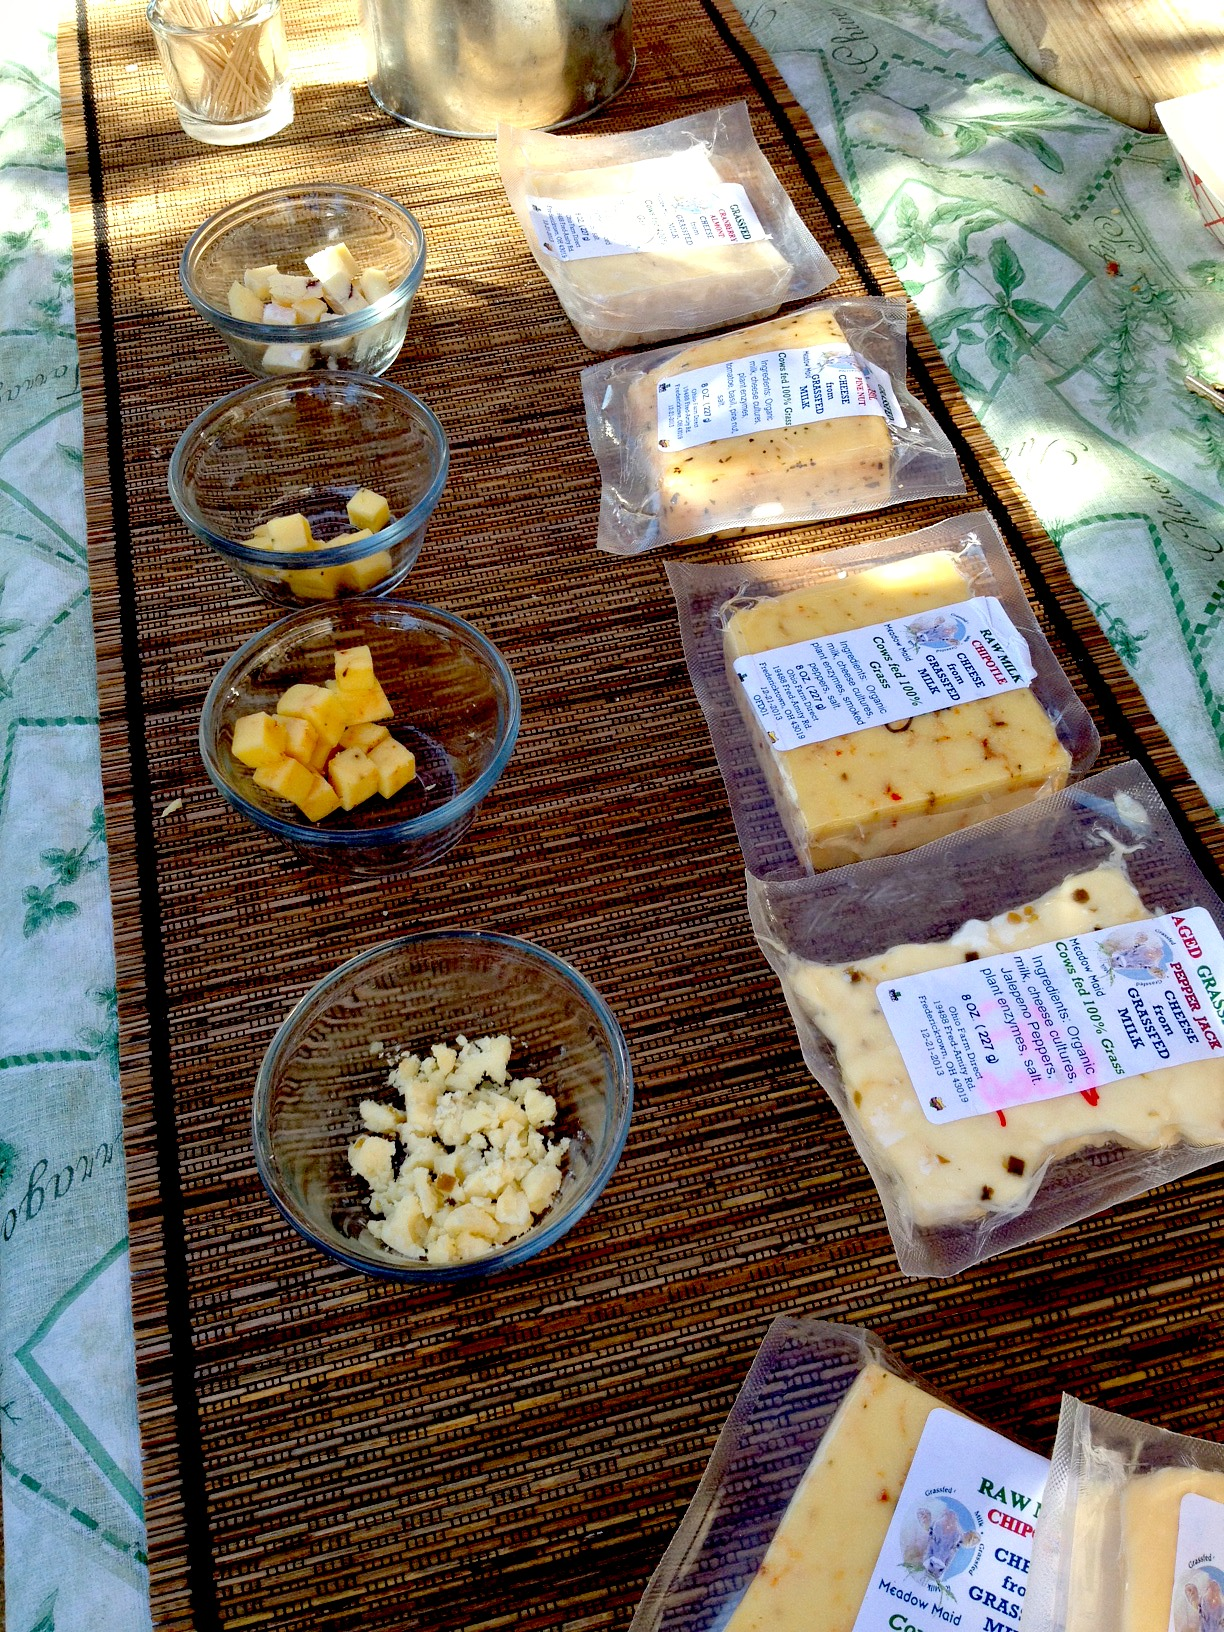 Cheese Guy - Farmers Market